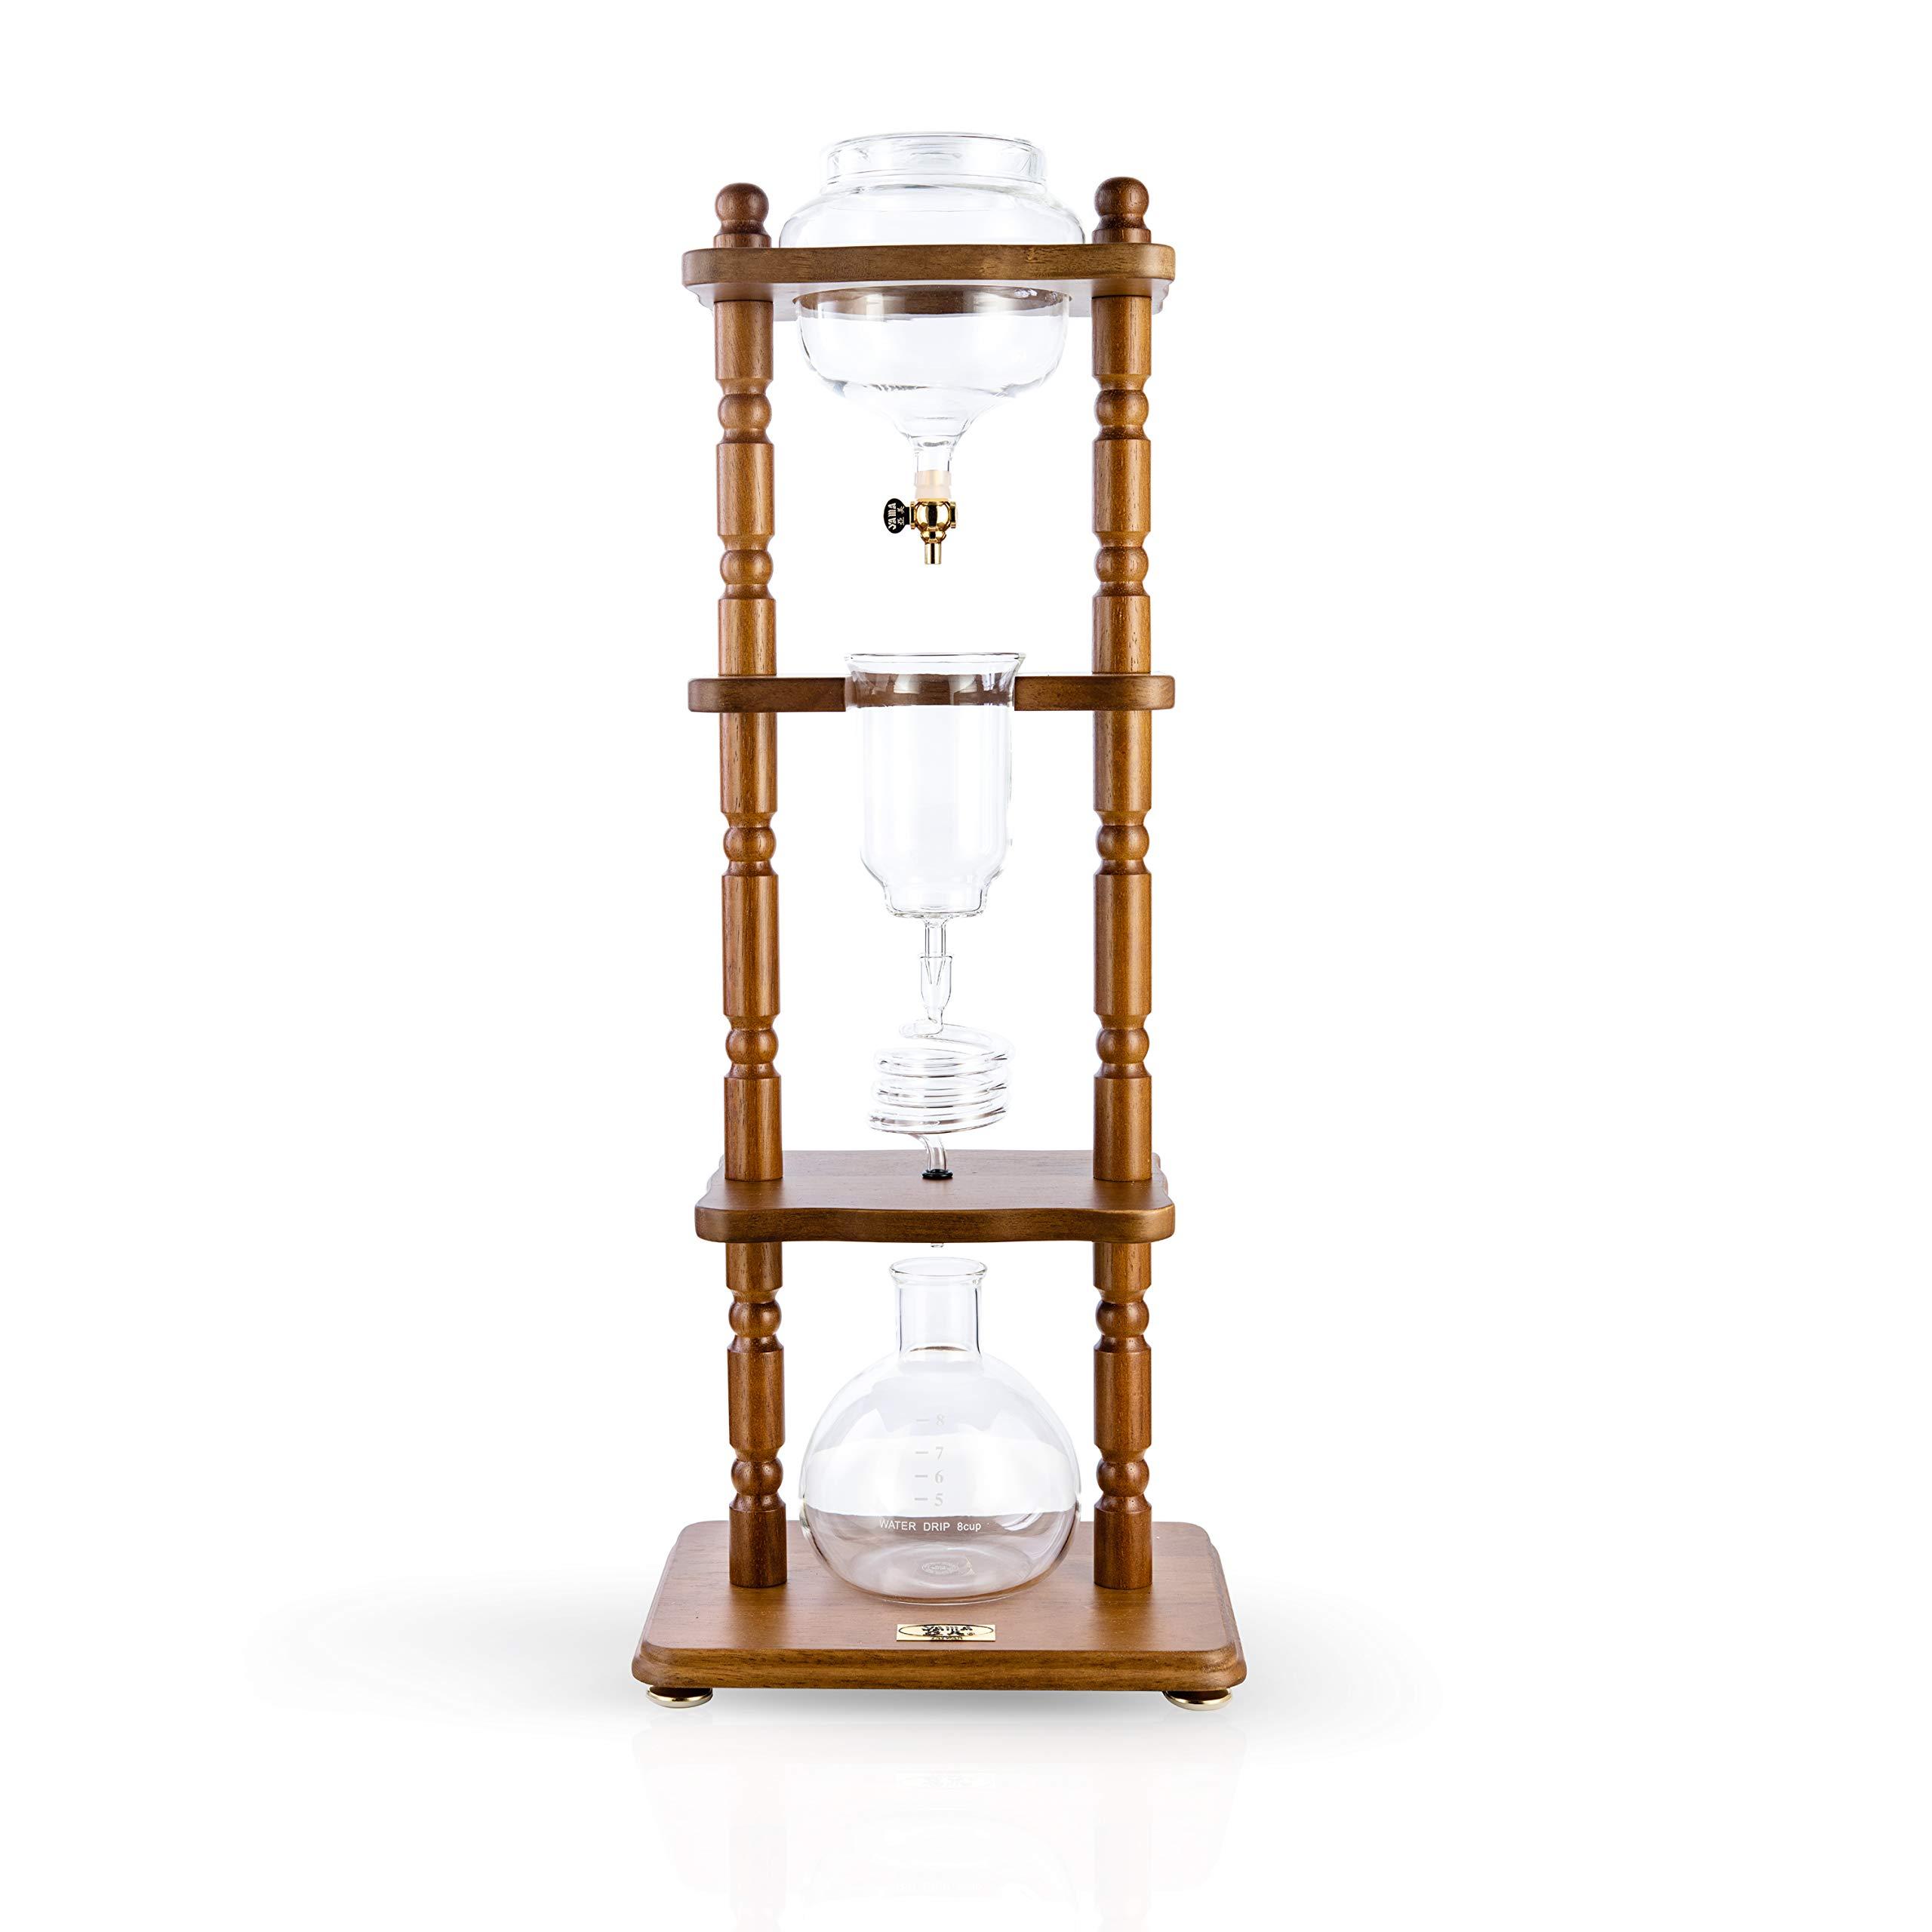 YAMA Glass YAMCDM8CBR, Brown Frame Cold Brew Drip Coffee Maker, 6-8 cup by Yama Glass (Image #1)